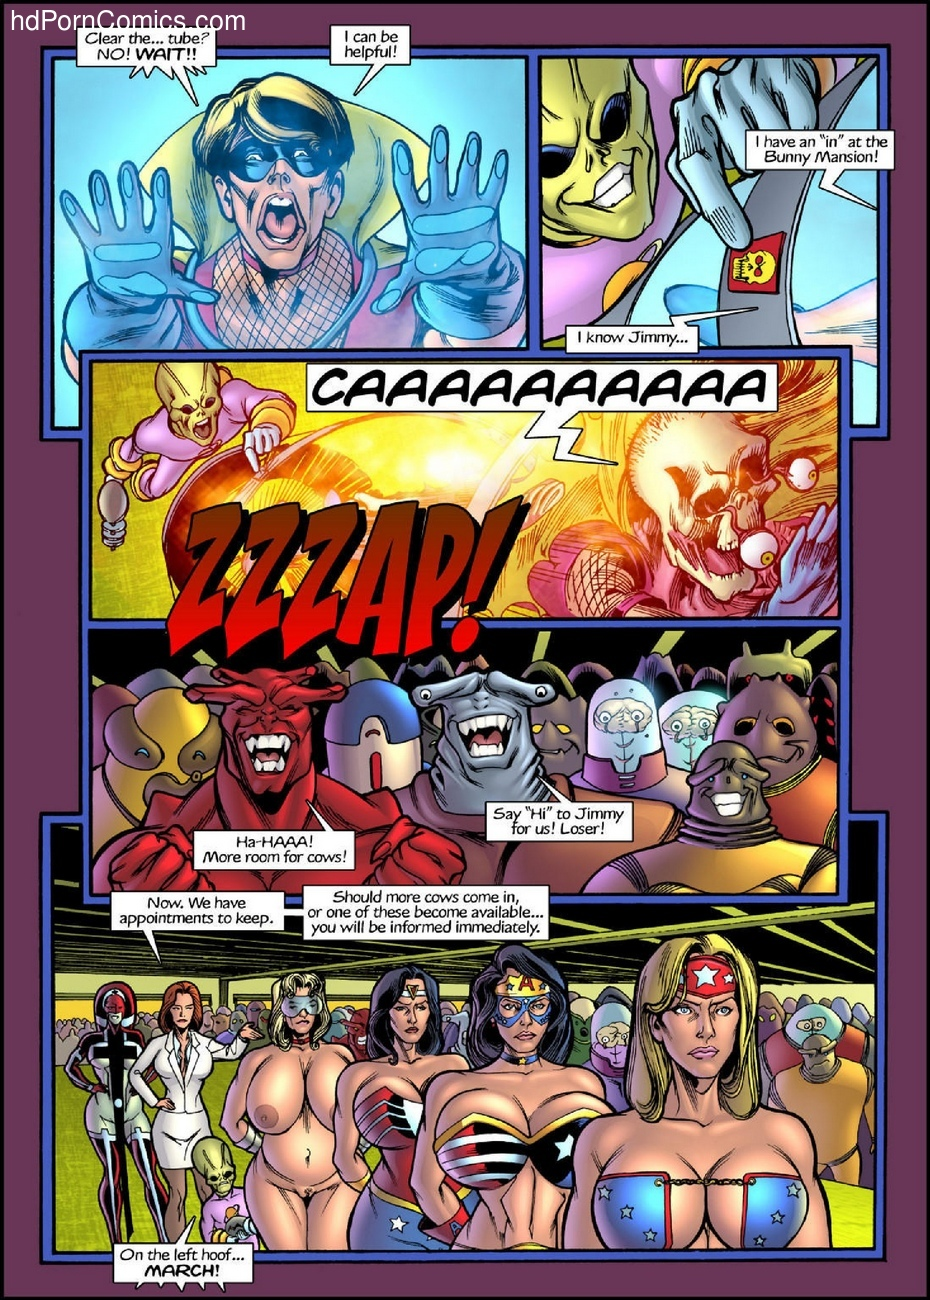 Freedom Stars - Cattle Call 1 50 free sex comic